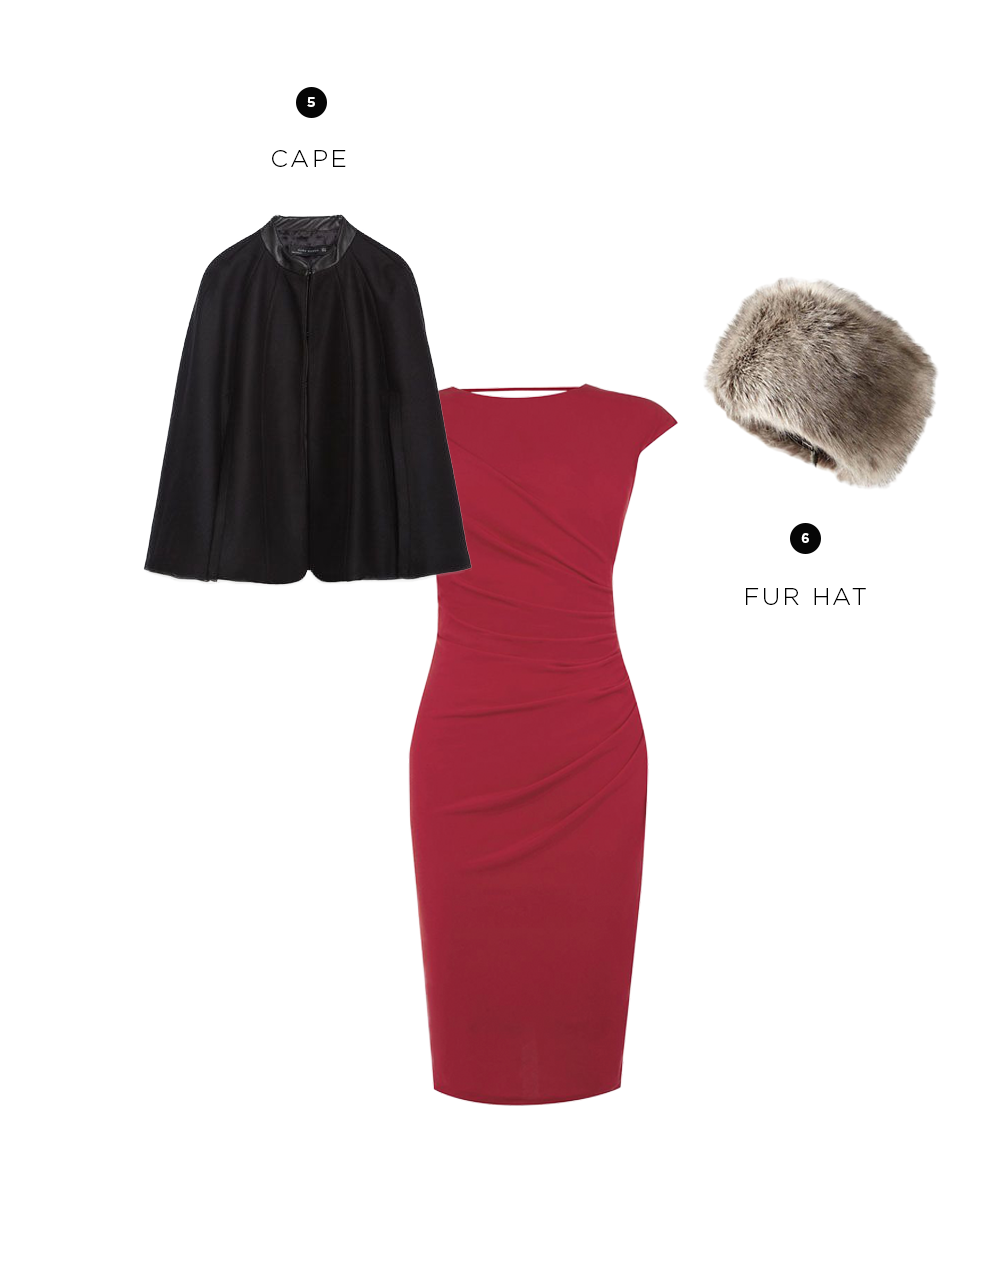 Dress: Oasis, $72 / 5. Zara, $149/ 6. Anthropologie, $98